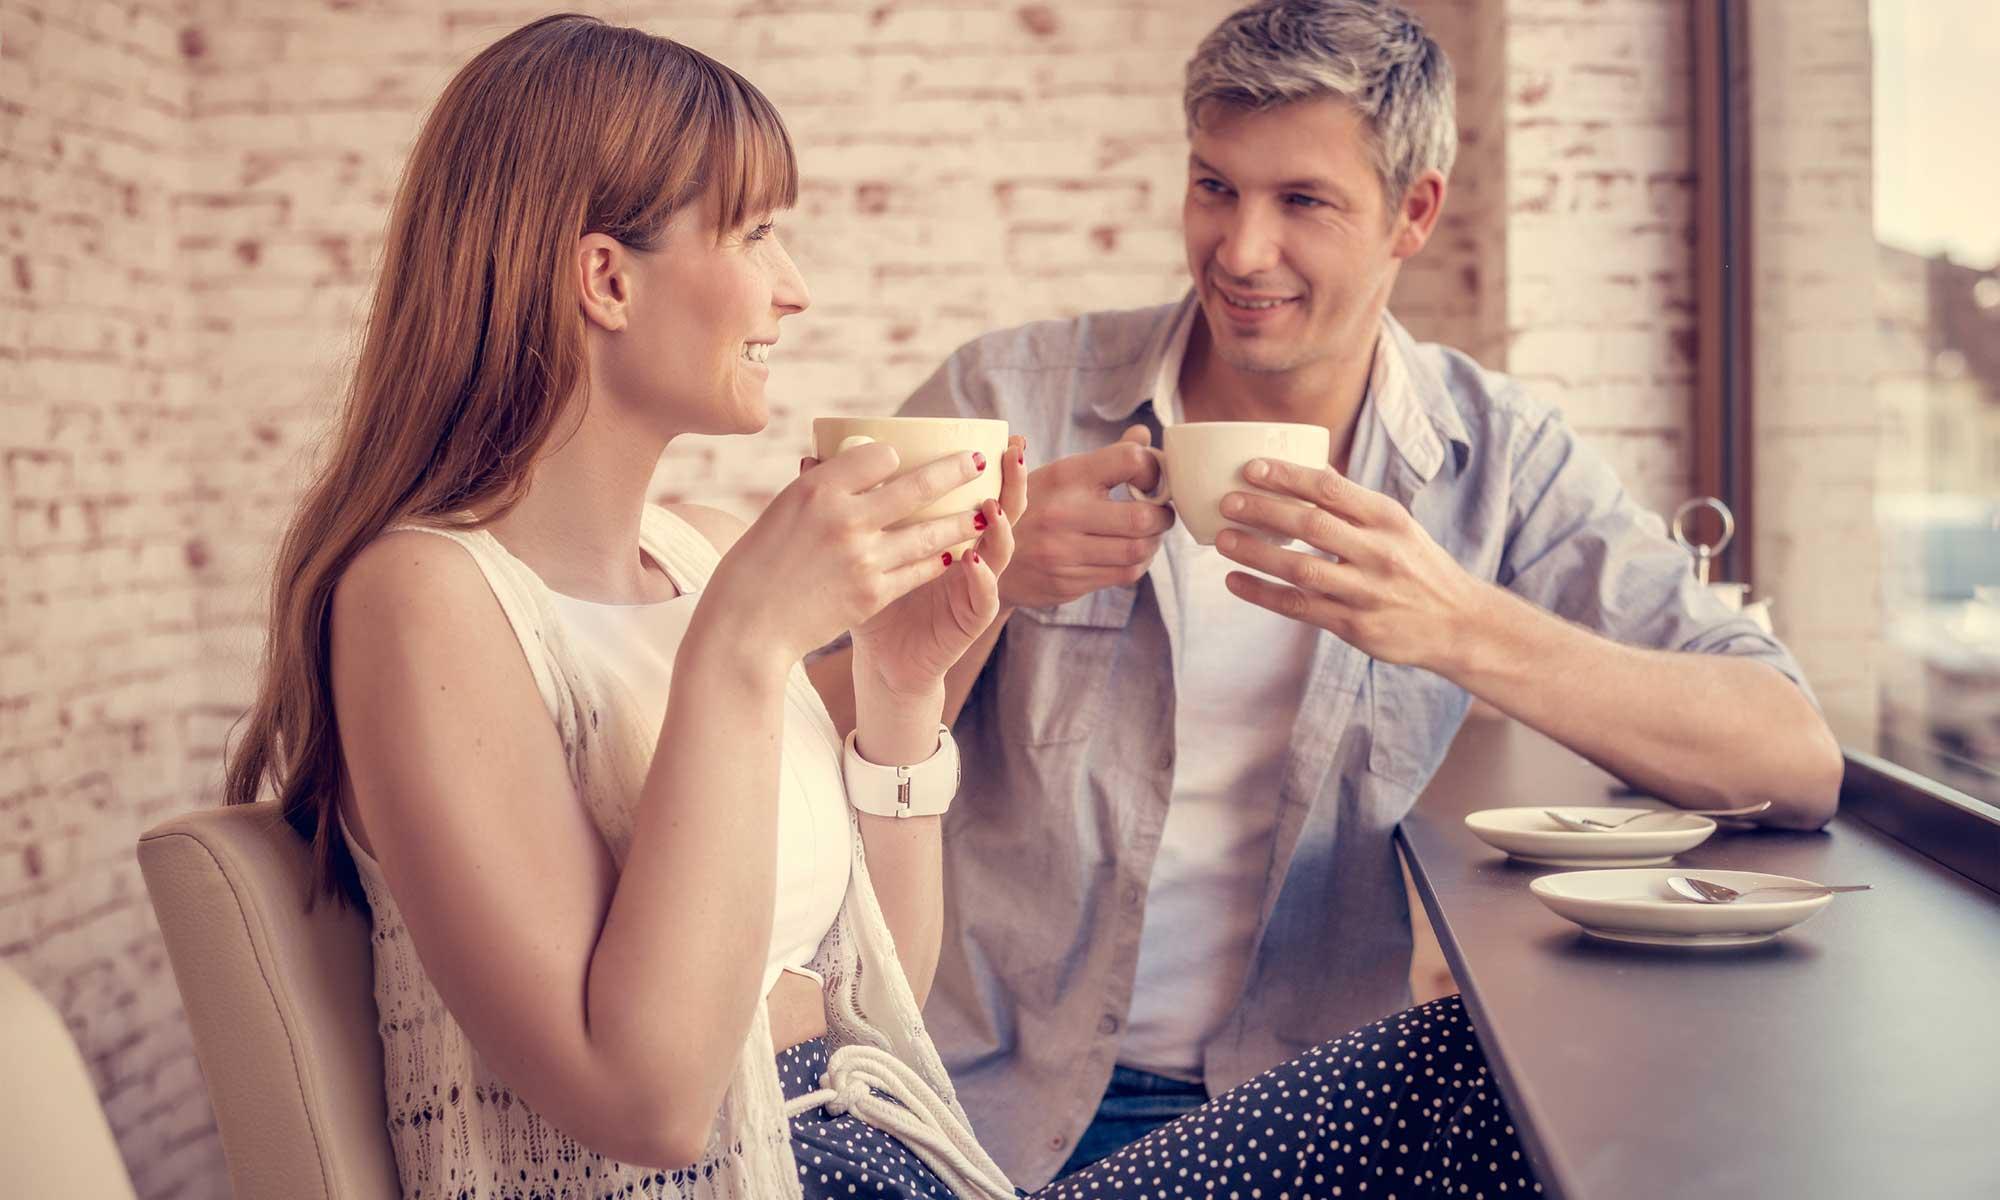 DatingCafe.singles